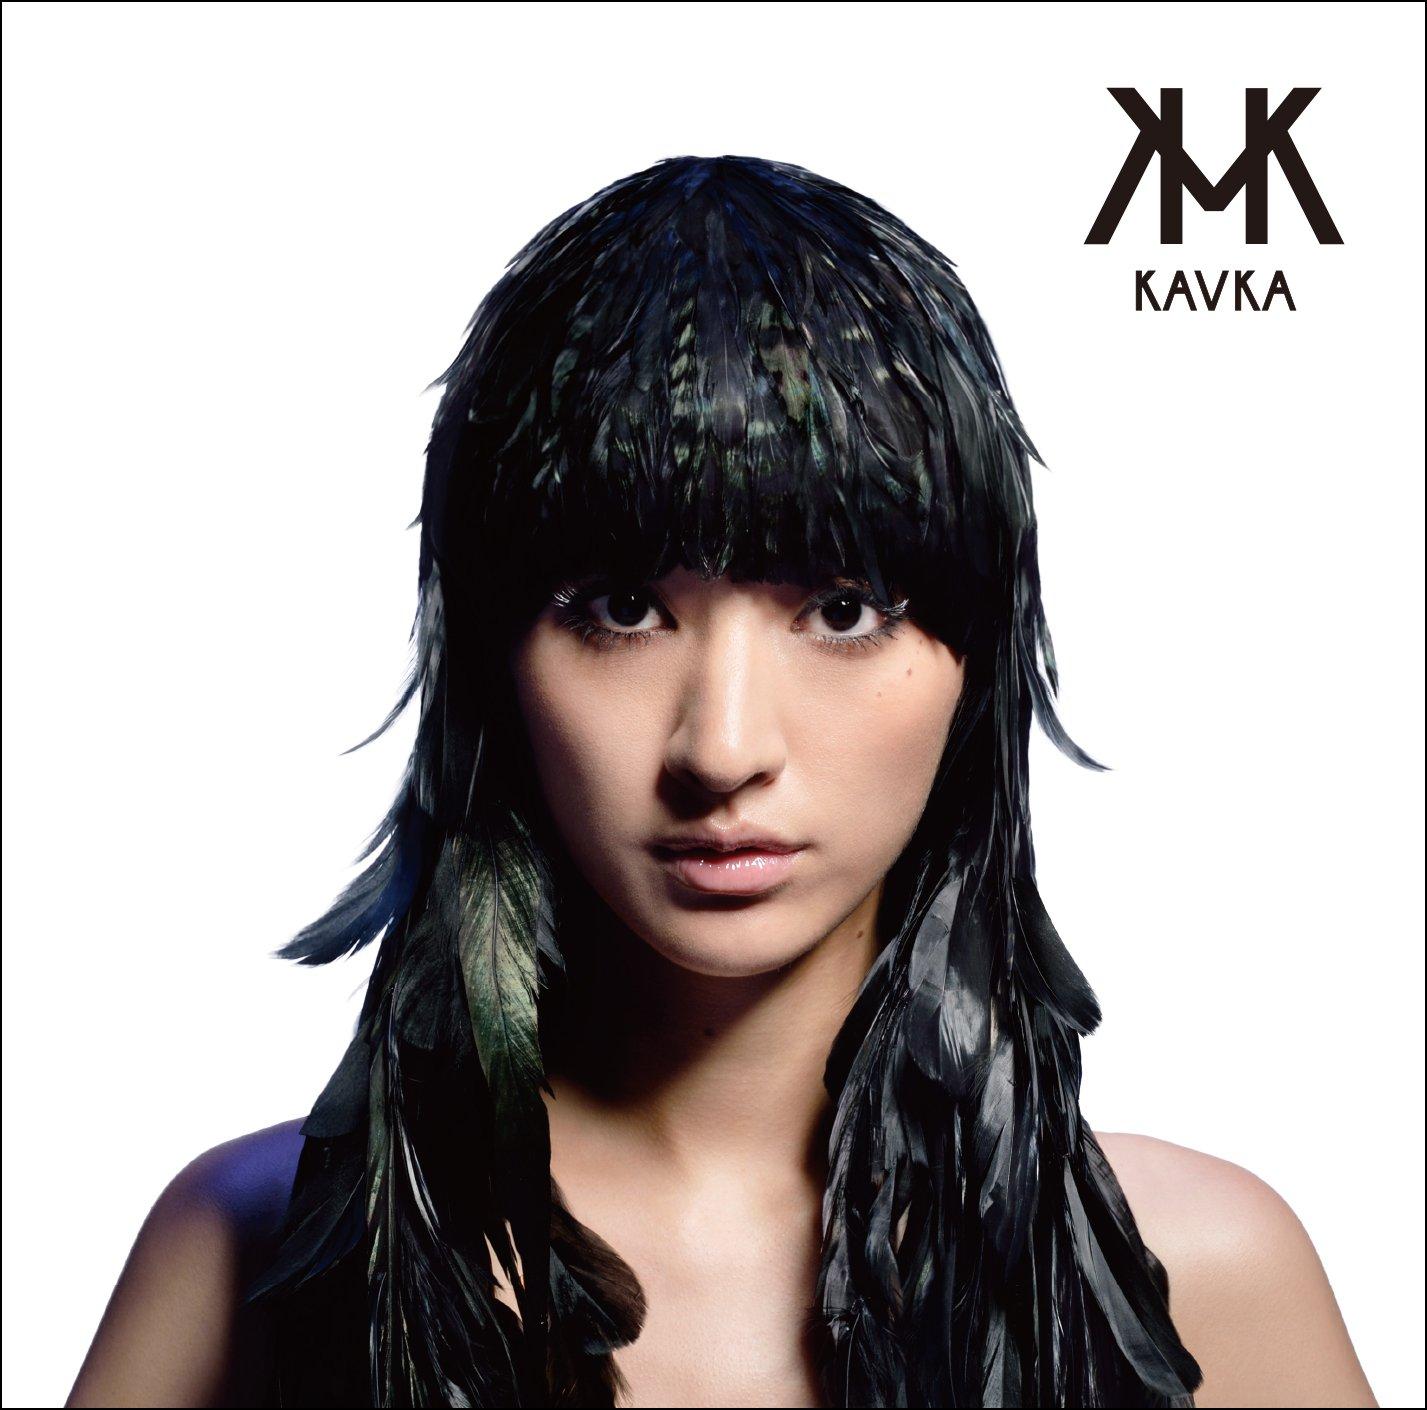 20160112.01.1 Shishido Kavka - Kavkanize (Deluxe edition) cover 1.jpg